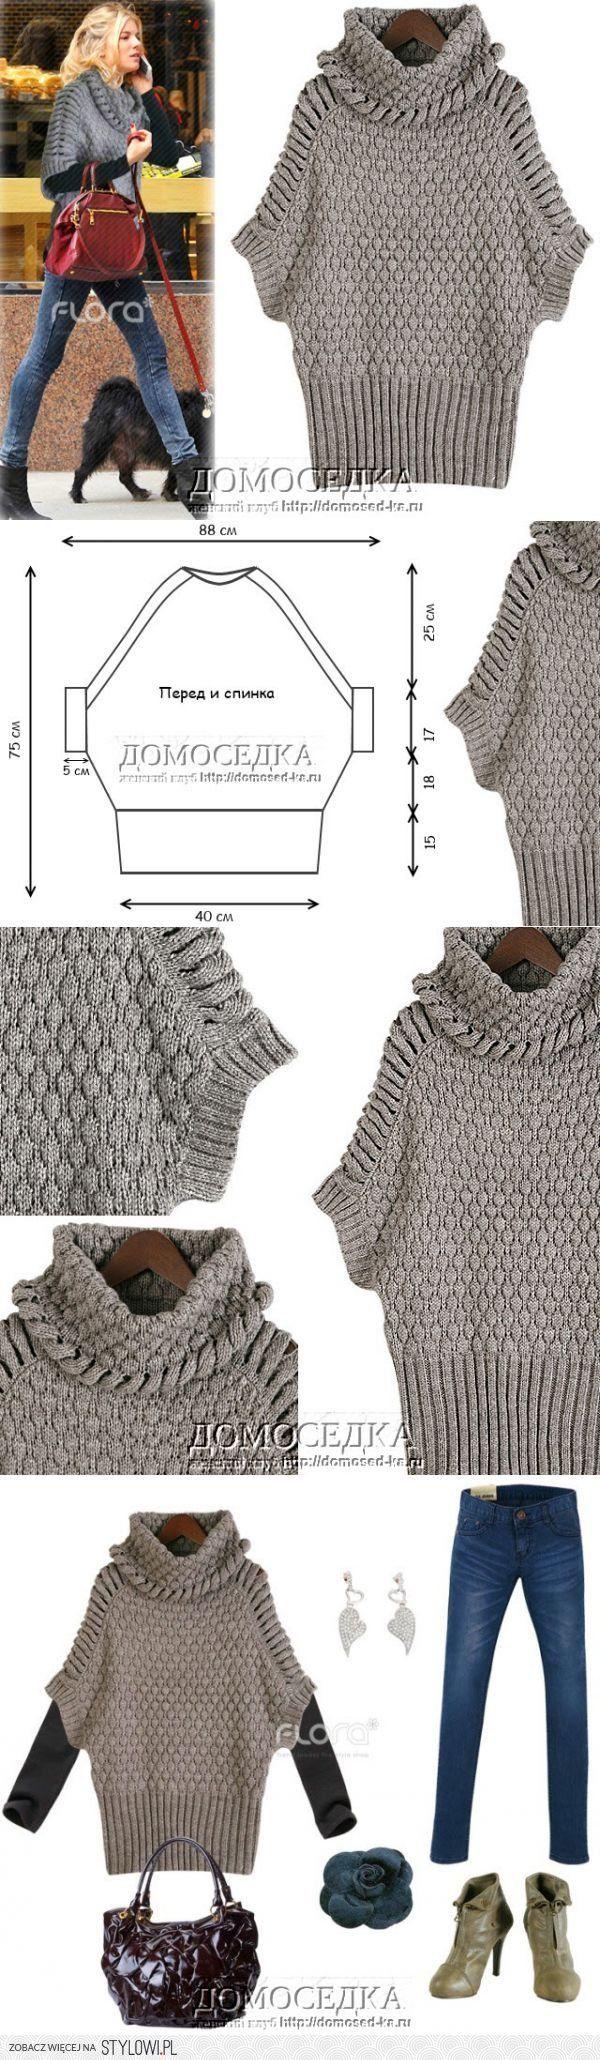 Пончо спицами | ДОМОСЕДКА | вязание (СПИЦЫ КРЮЧОК МАШИ… na Stylowi.pl